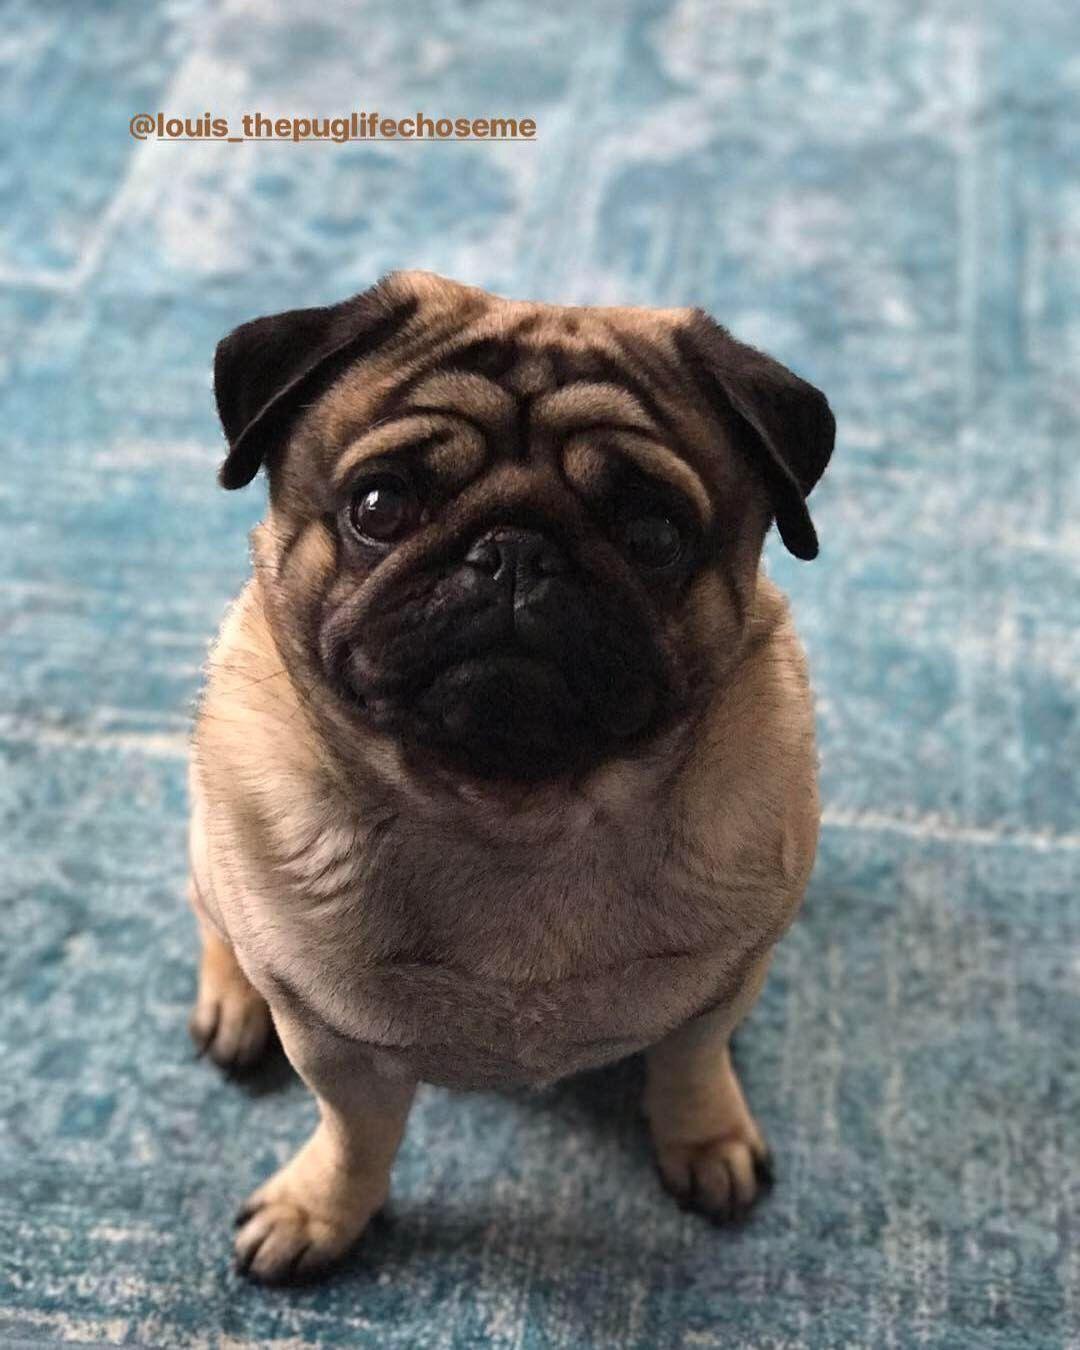 Cute Black Pug Puppy Baby Pugs Black Pug Puppies Baby Pug Dog